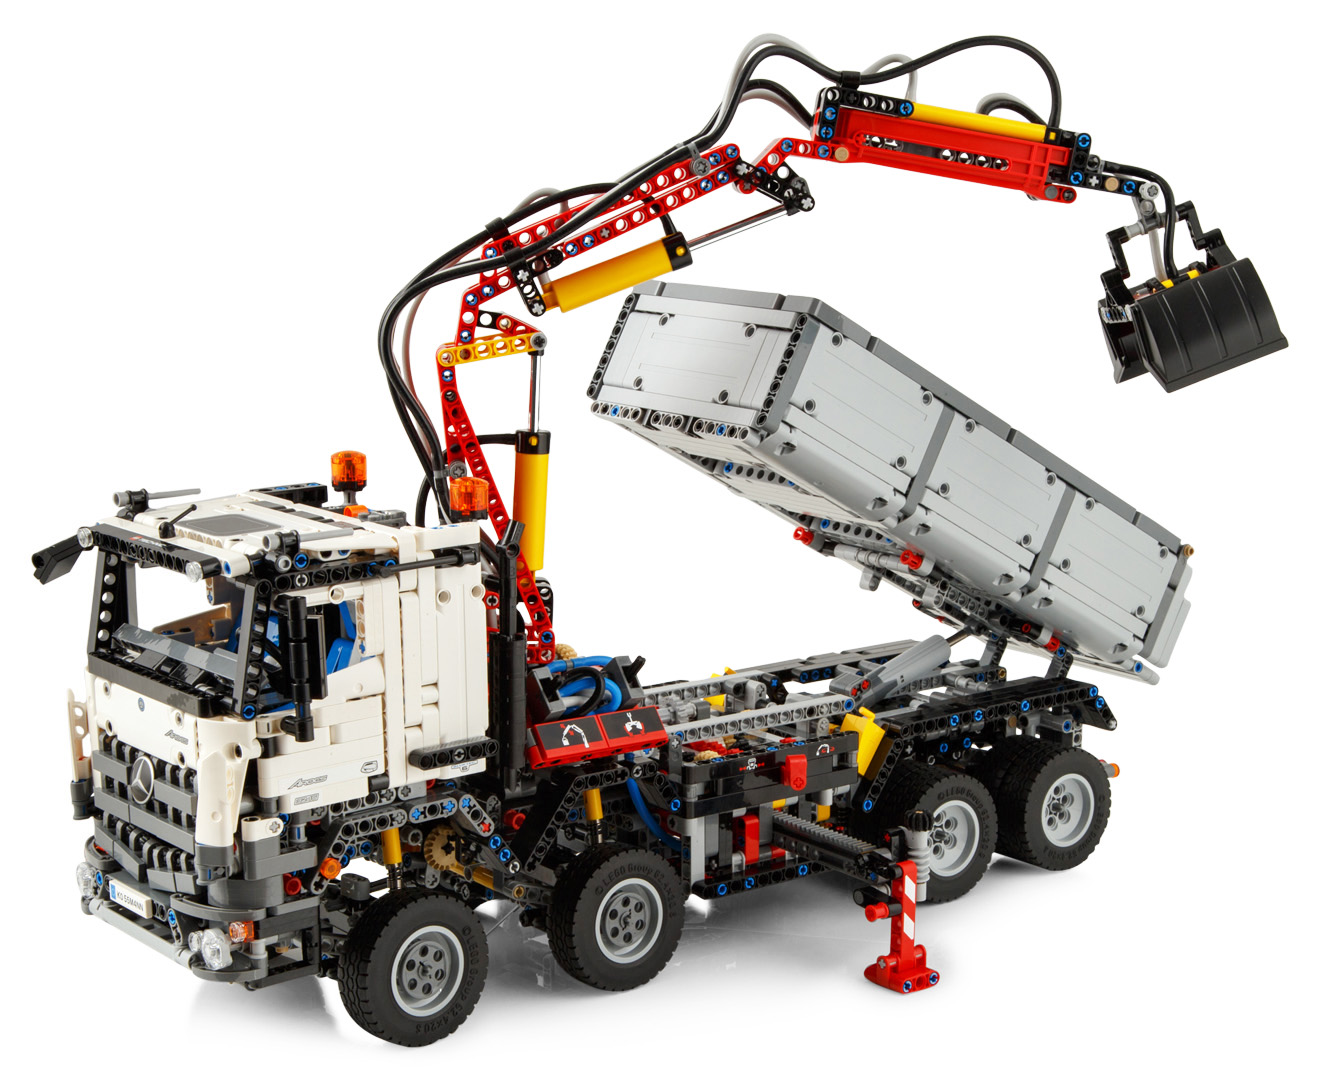 Lego technic mercedes benz arocs 3245 building set for Lego mercedes benz